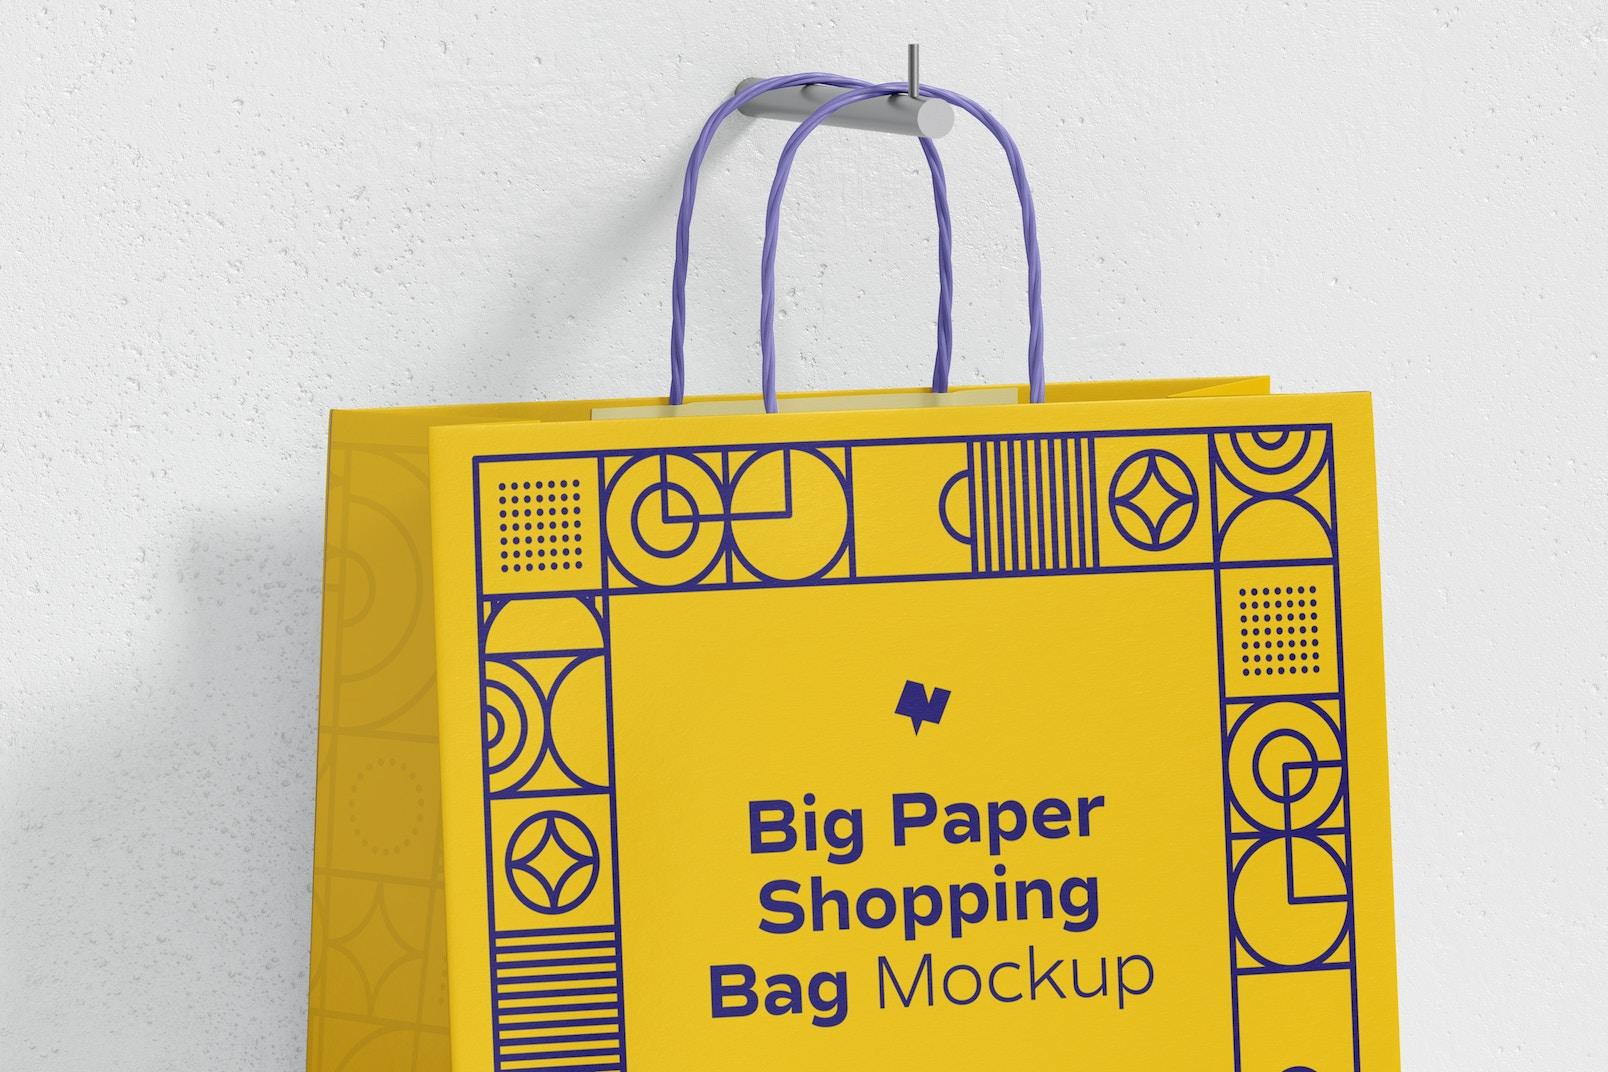 Big Paper Shopping Bags Mockup, Top View